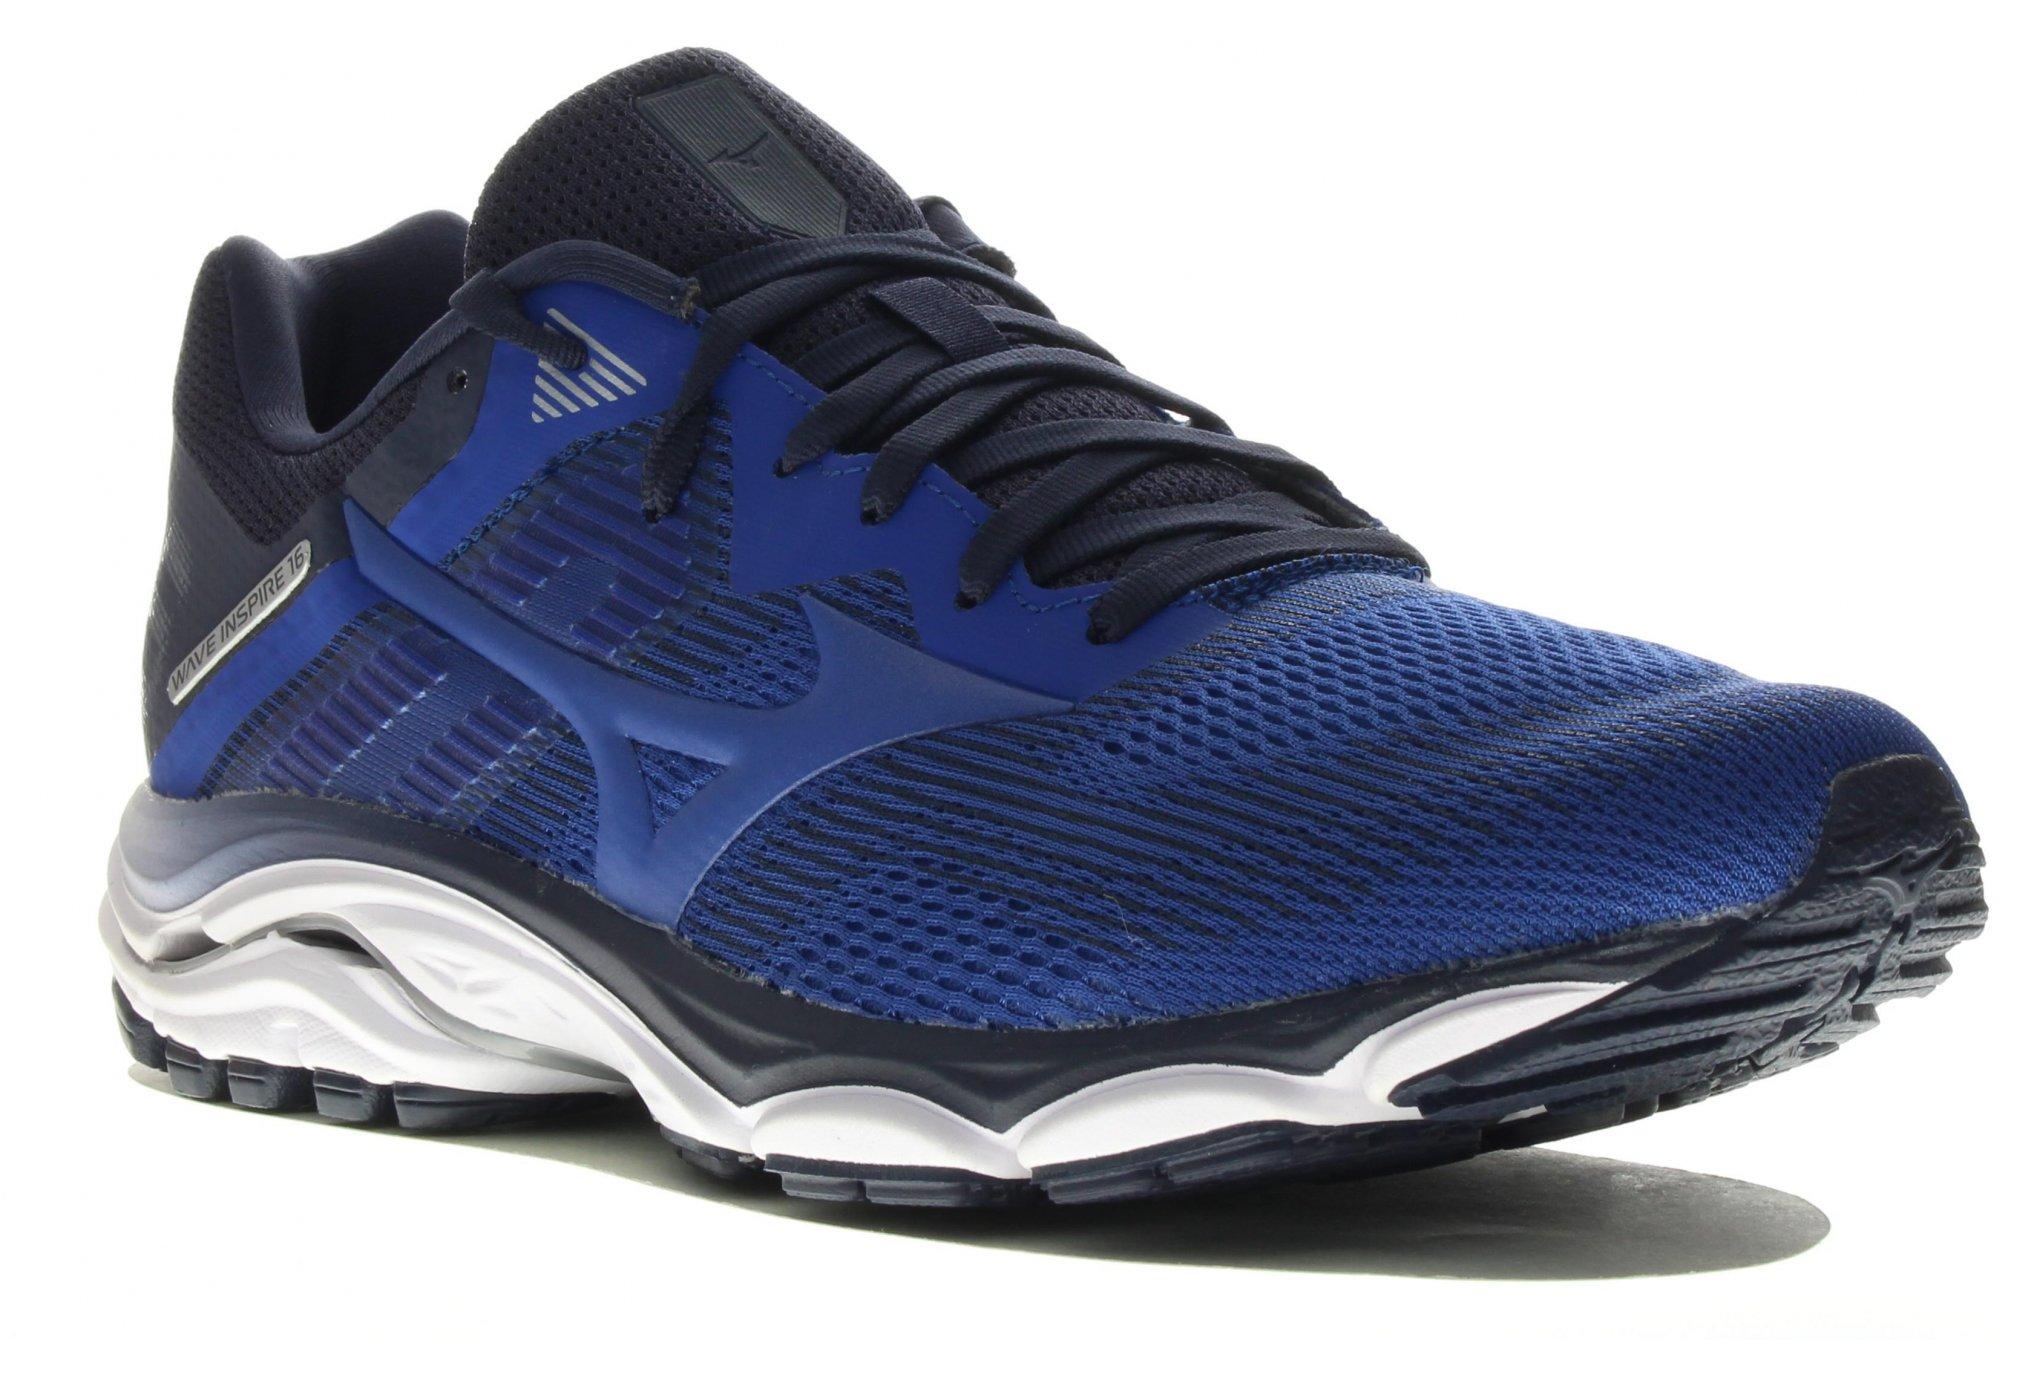 Mizuno Wave Inspire 16 Chaussures homme